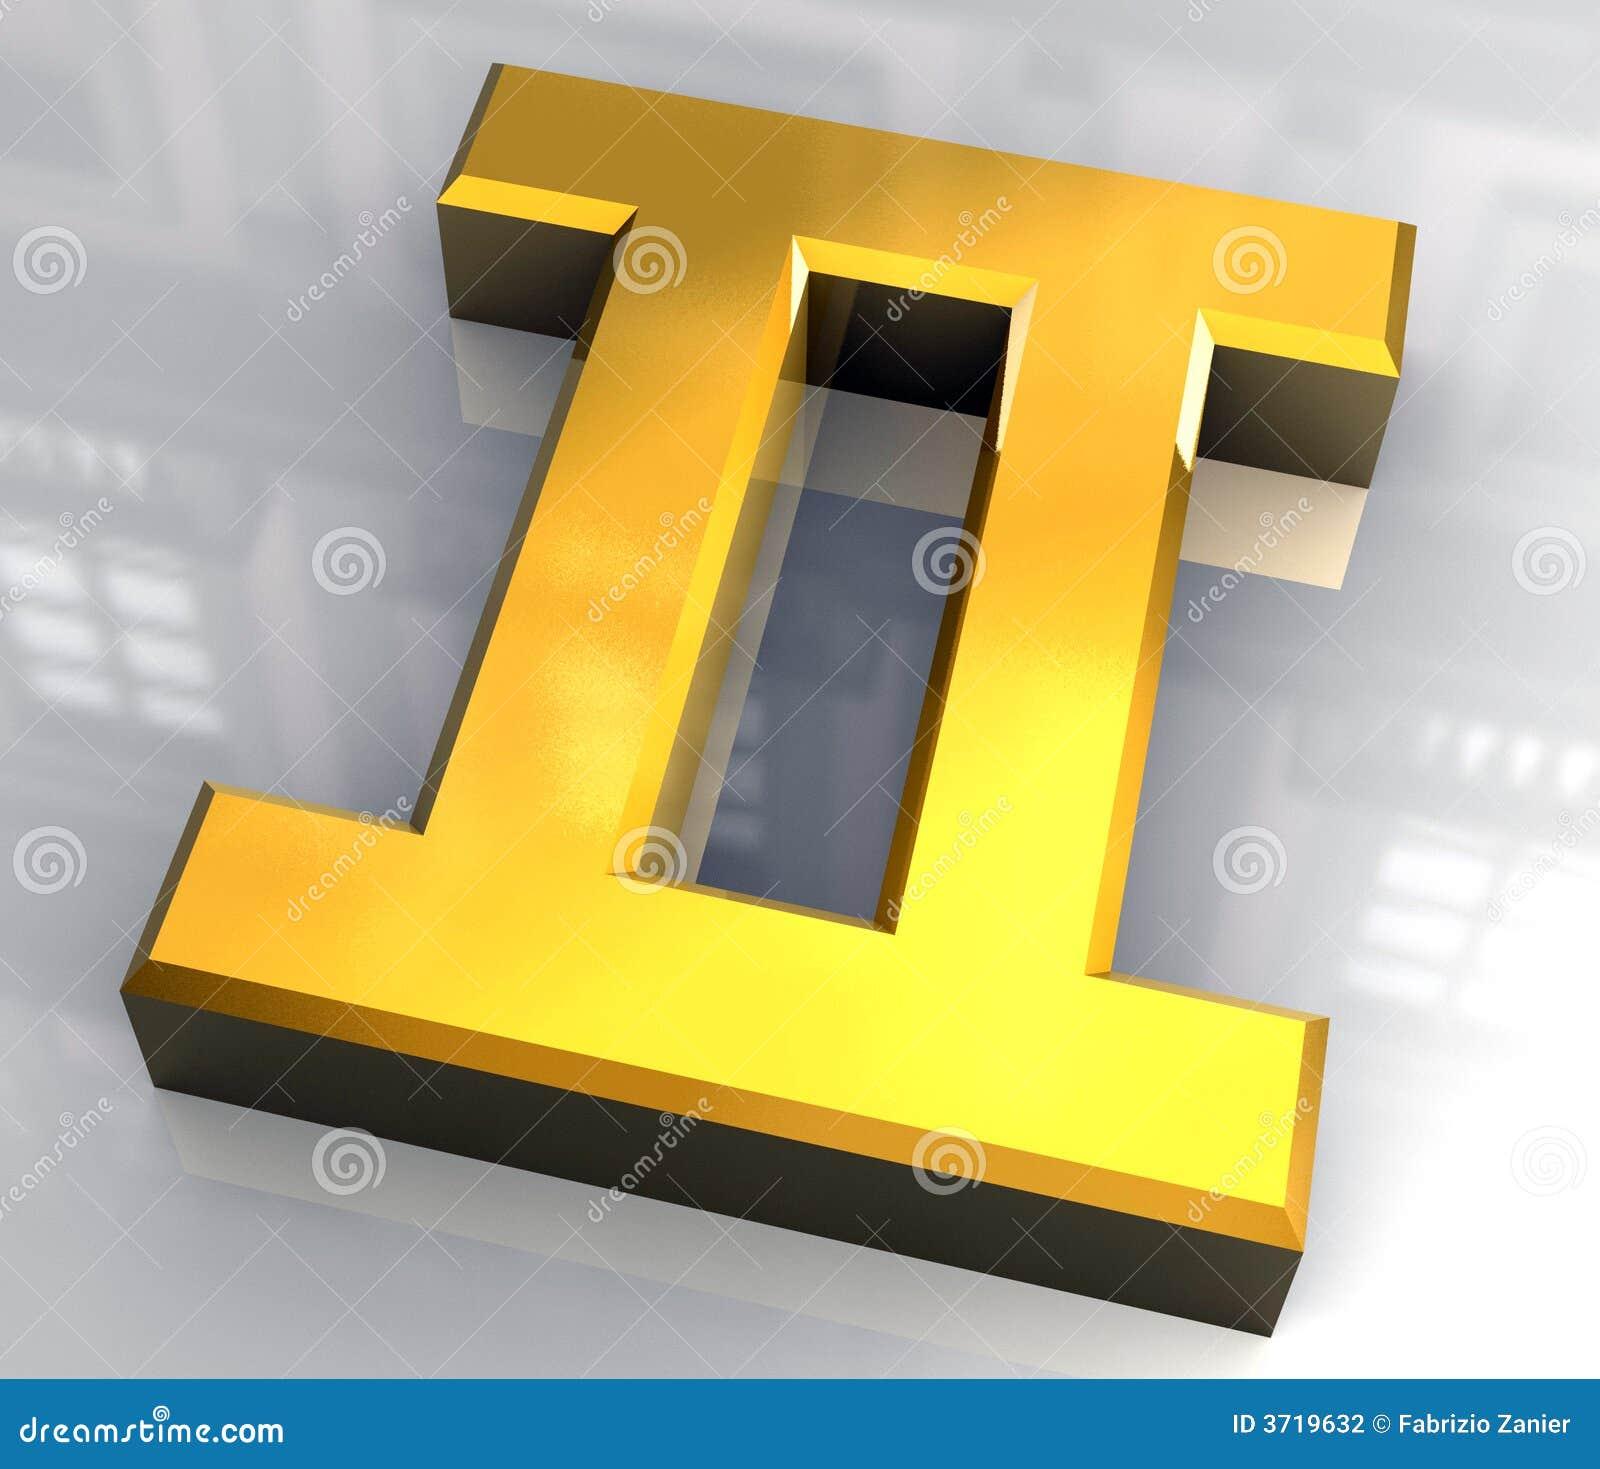 Gemini astrology symbol in gold 3d stock illustration gemini astrology symbol in gold 3d isolated astrological buycottarizona